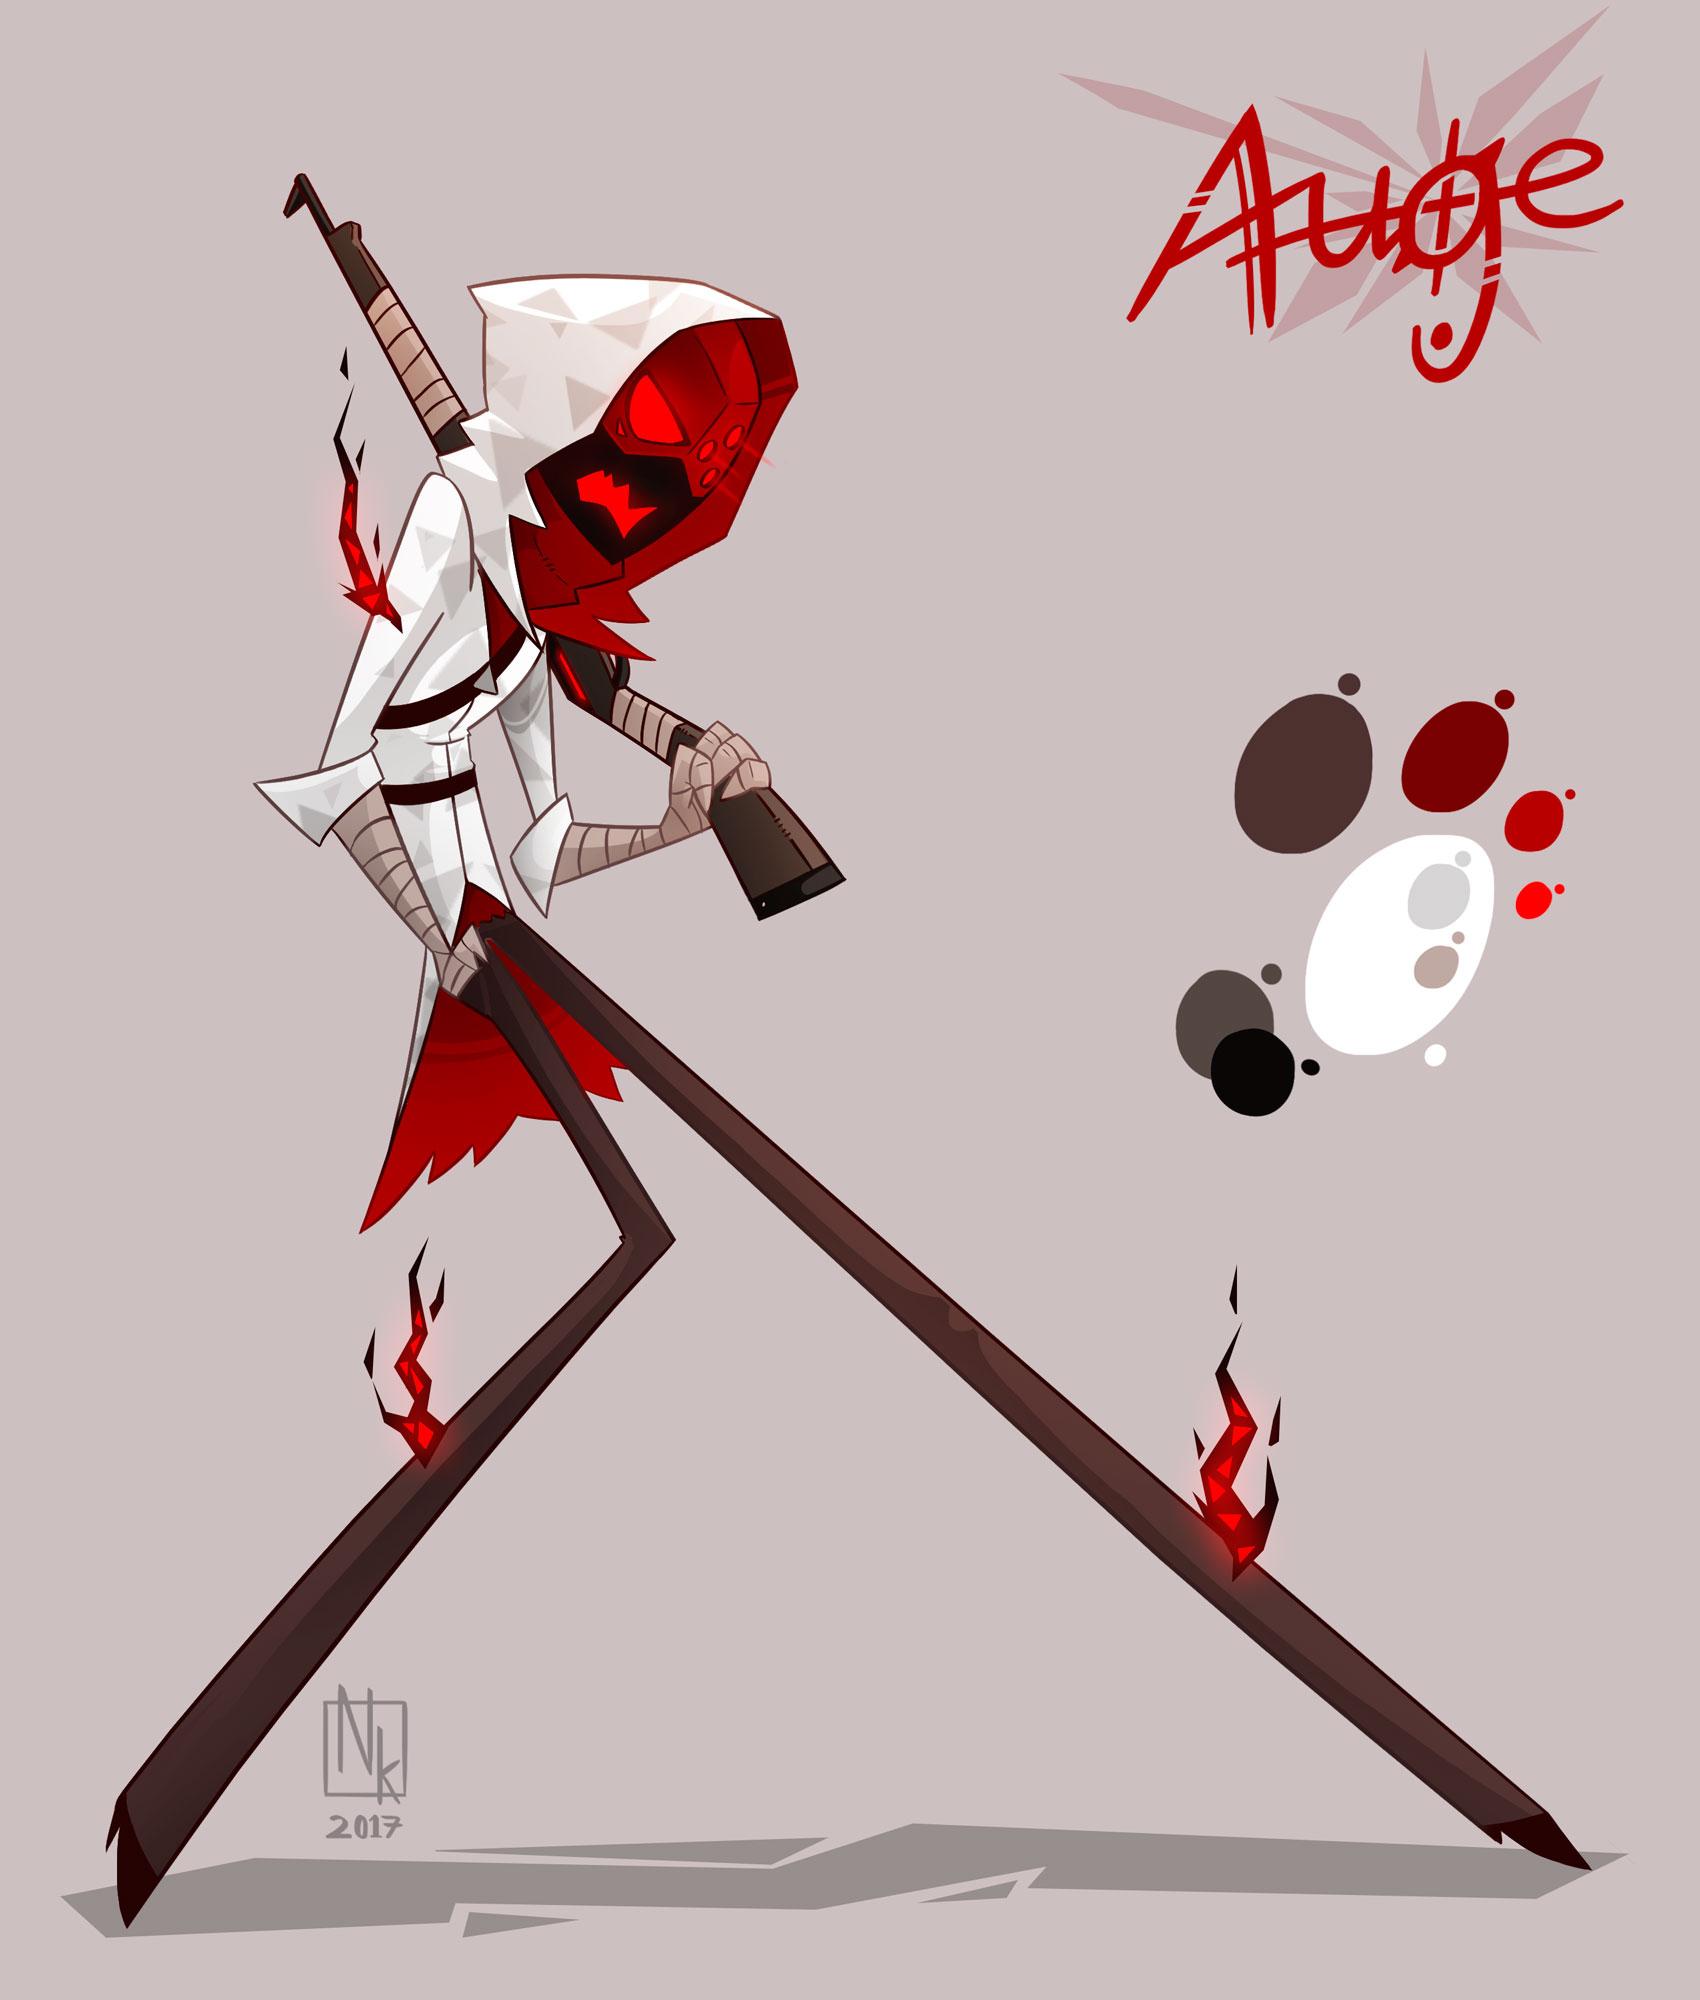 Webcomic character #3: Auge